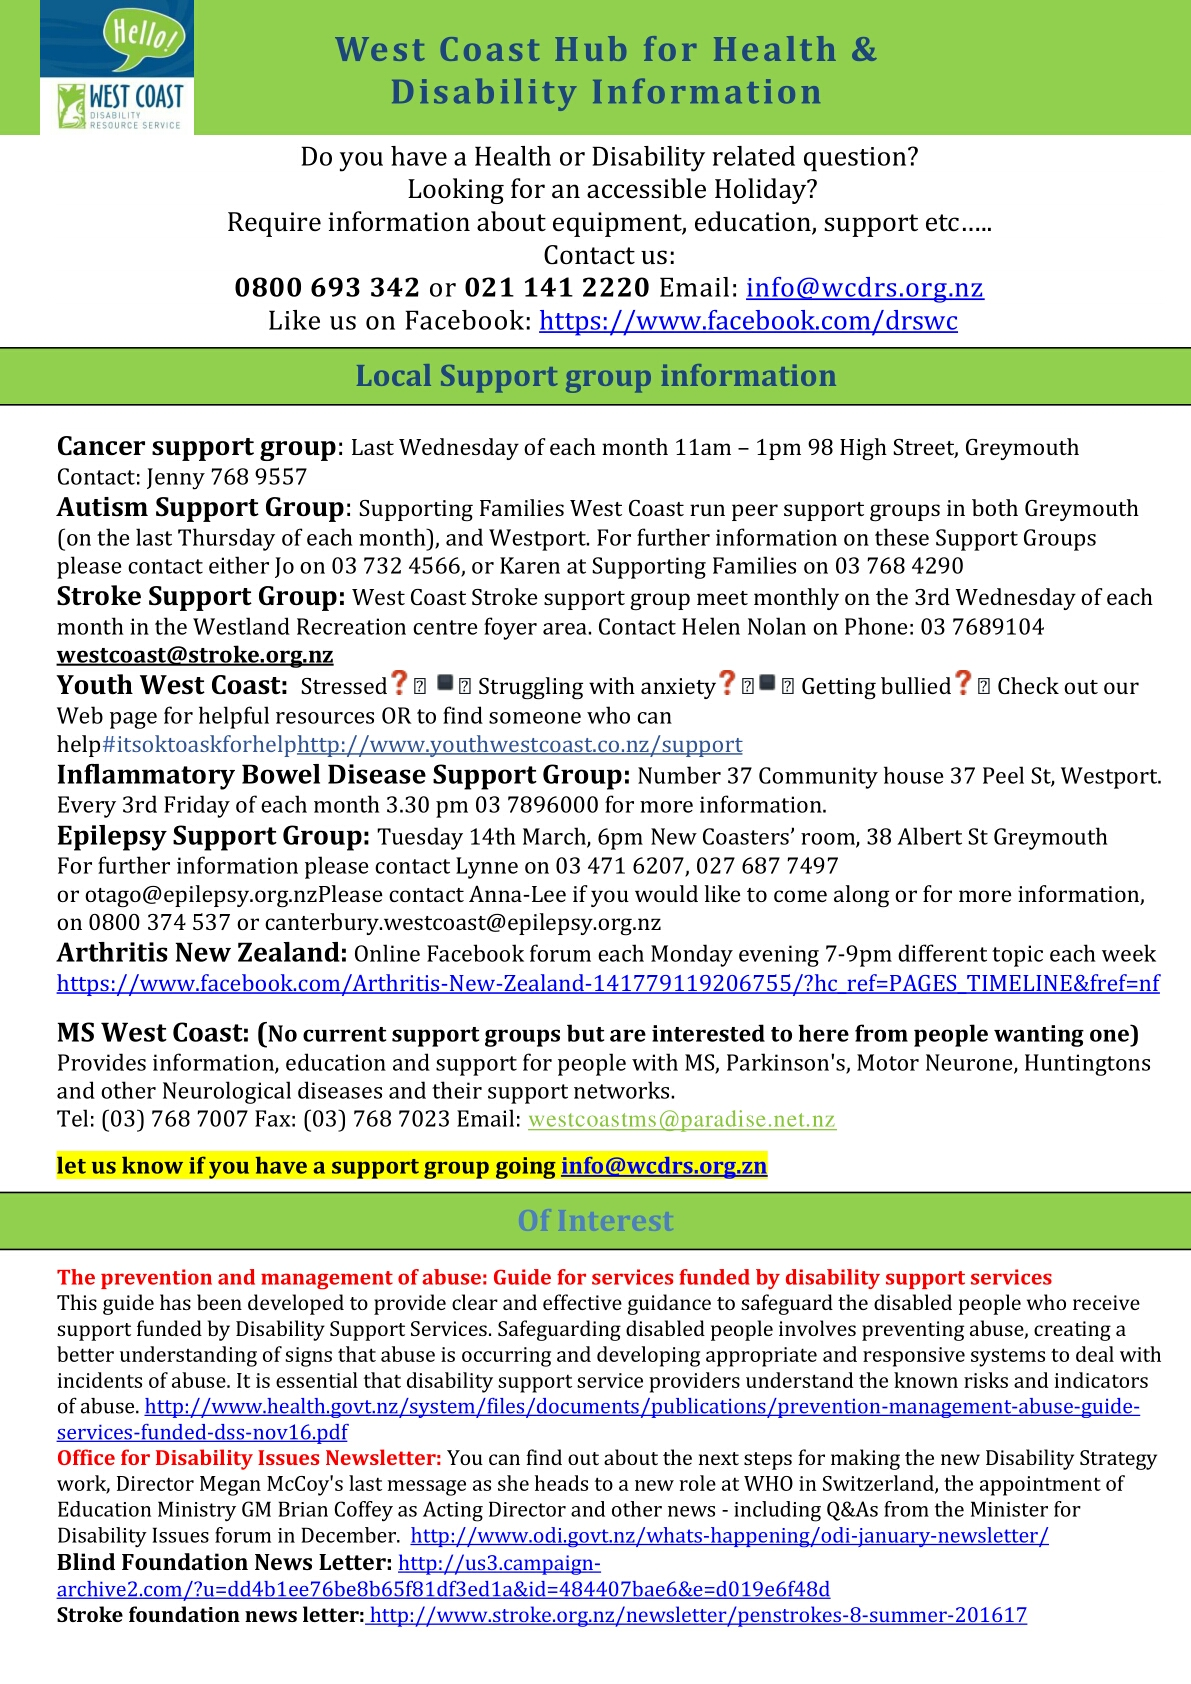 [1]WCDRS news letter 1.jpg